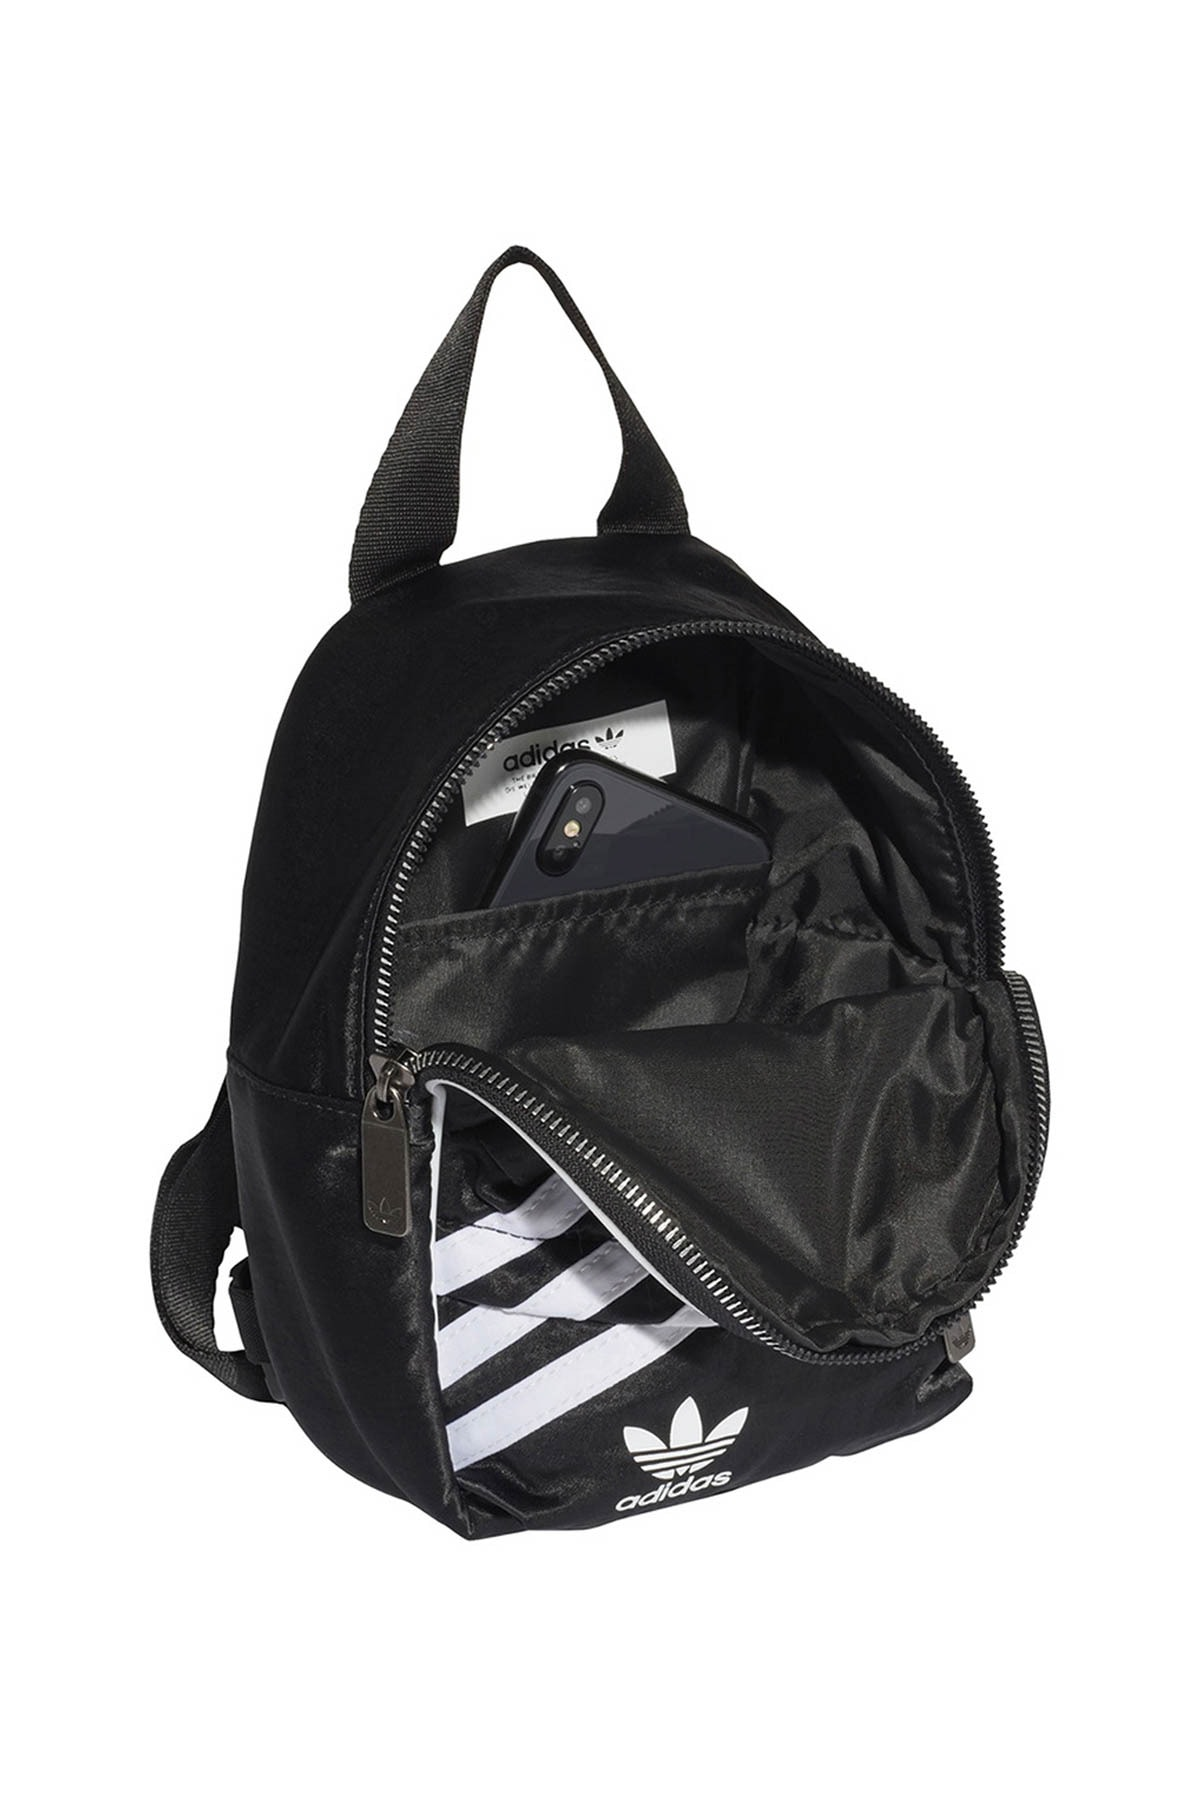 adidas Kadın Sırt Çantası -  Bp Mını  - GD1642 2